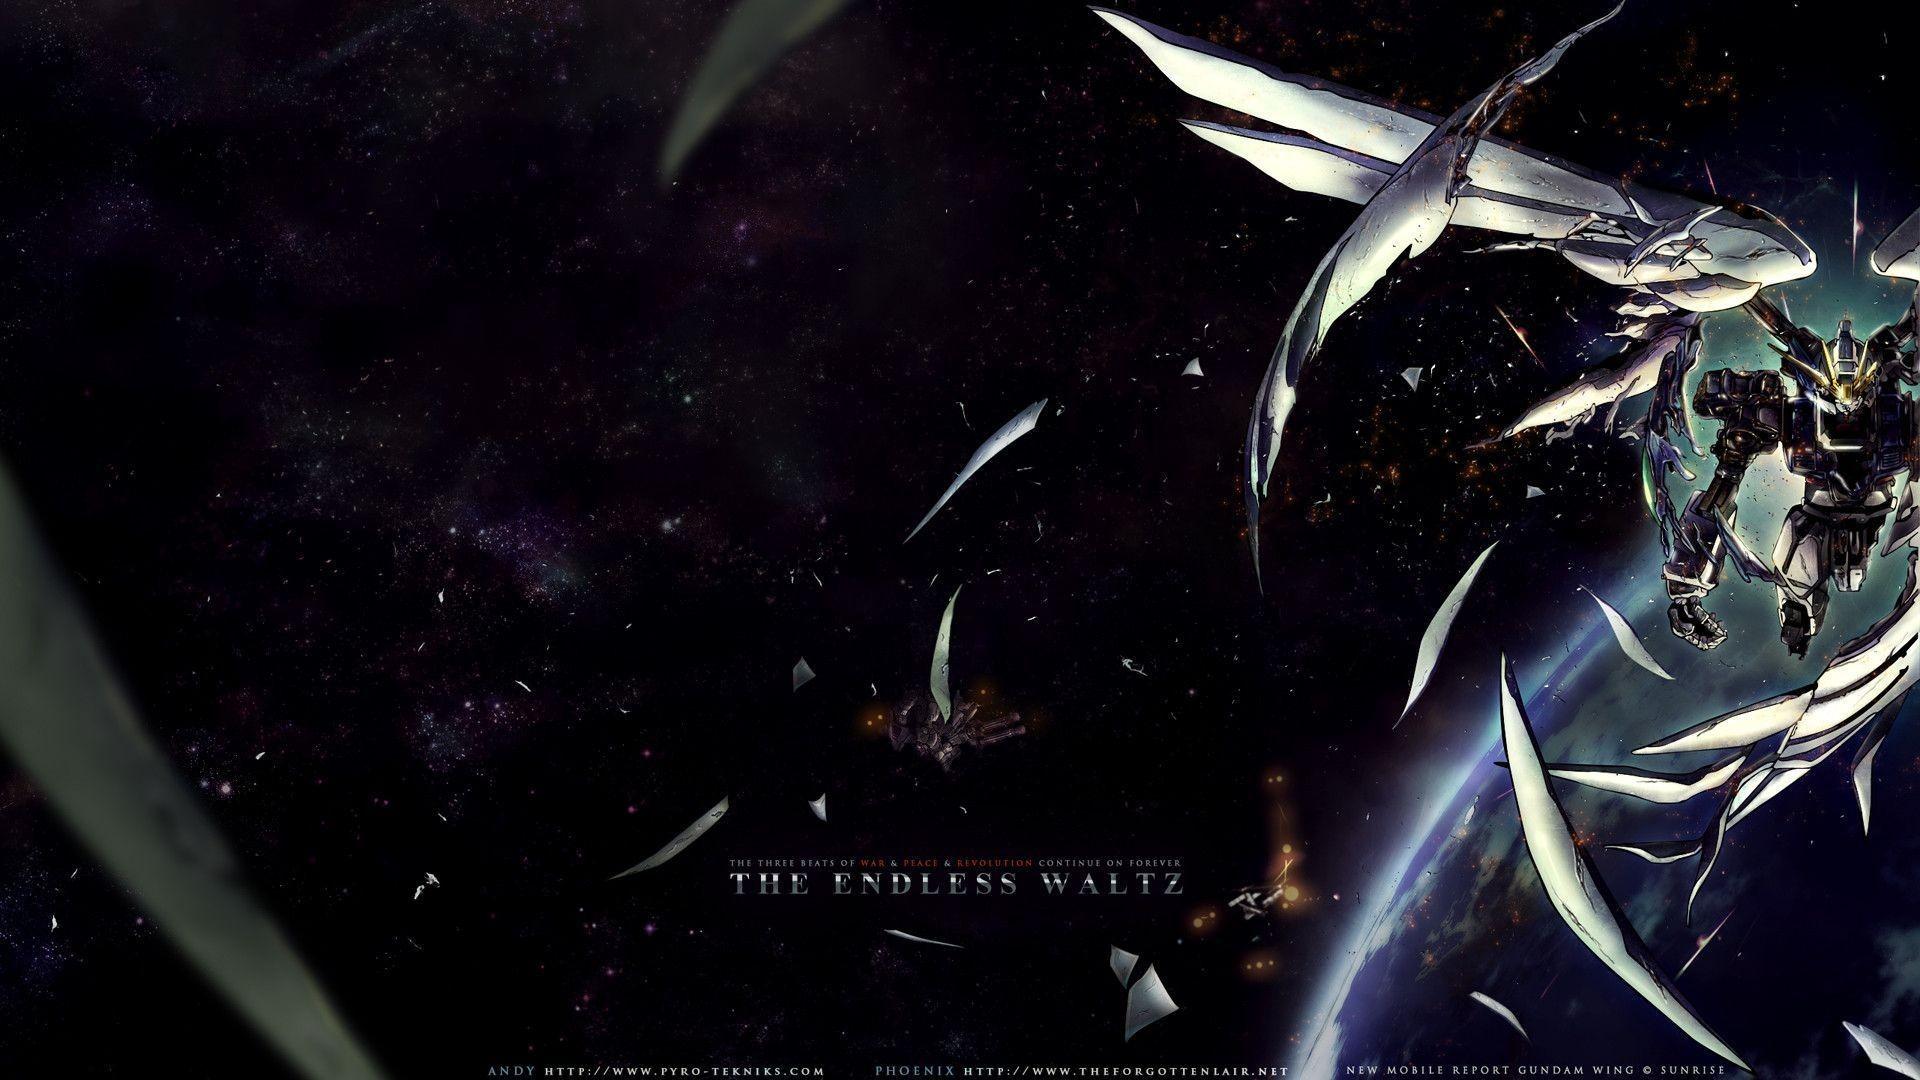 Gundam Barbatos wallpaper ·① Download free cool full HD